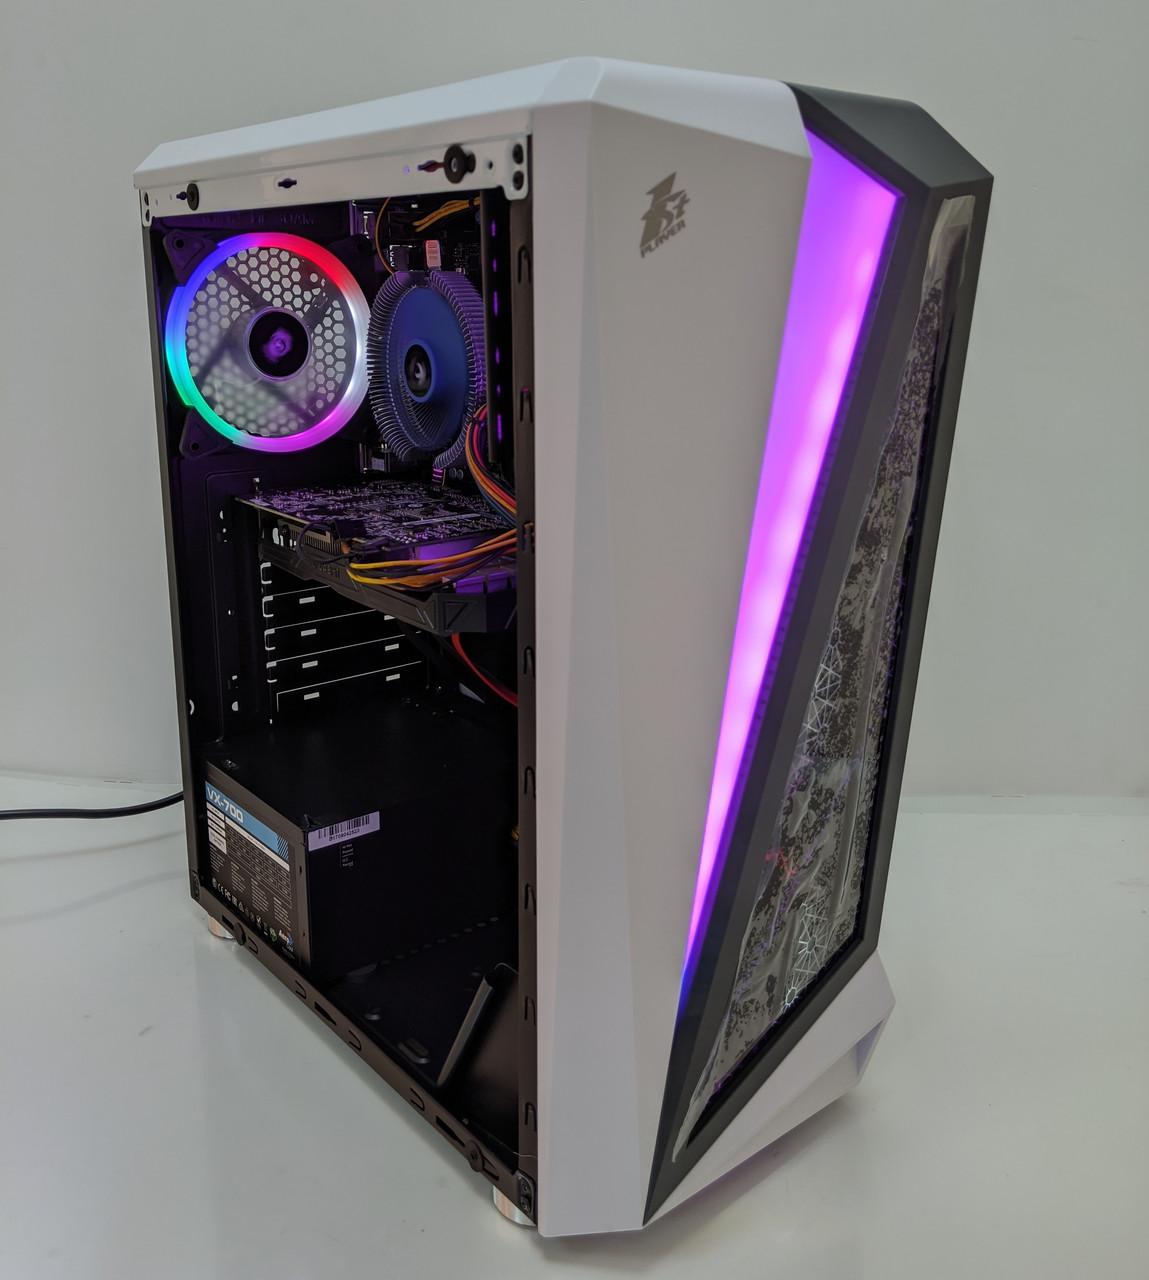 Игровой компьютер i3-9100F \ 8 Gb \ 500Gb \ GTX 1060 - 3Gb